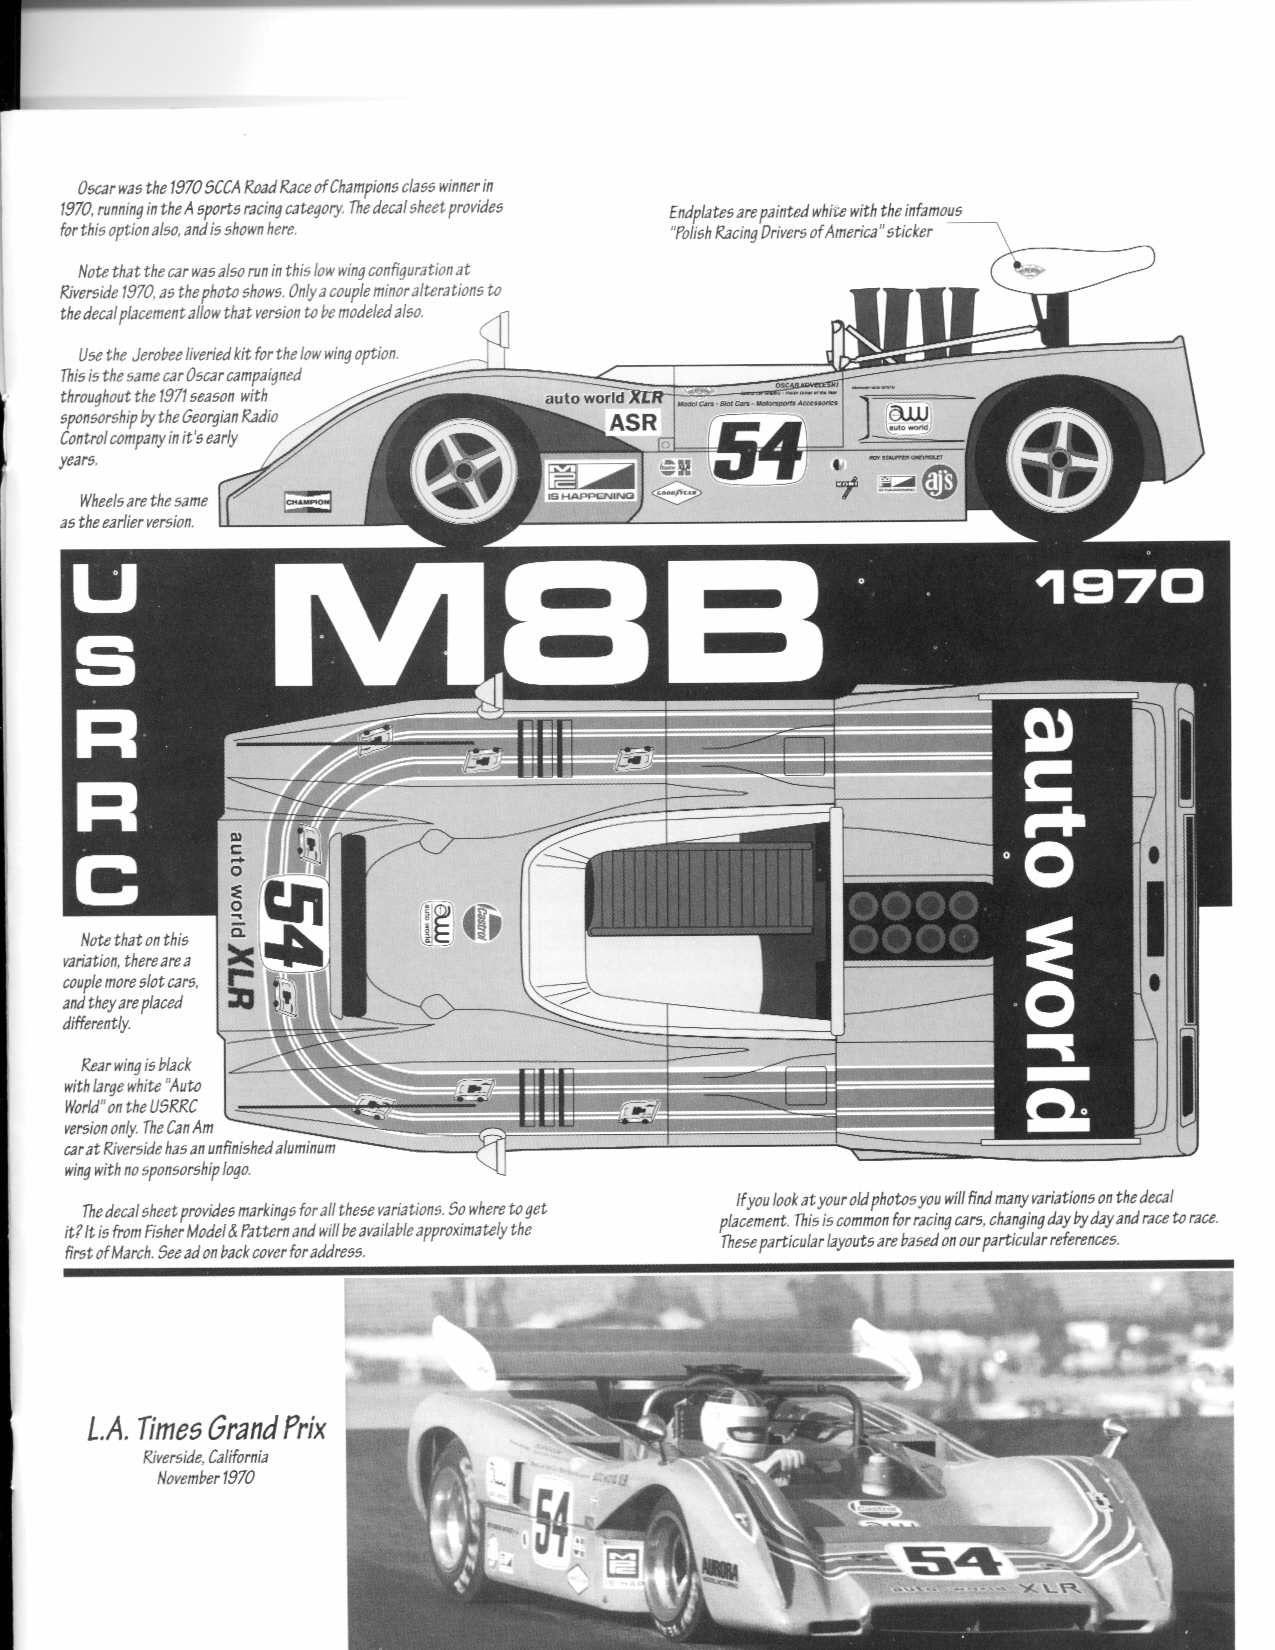 bmw m3 gtr blueprint. car blueprints. image result for free sports ...